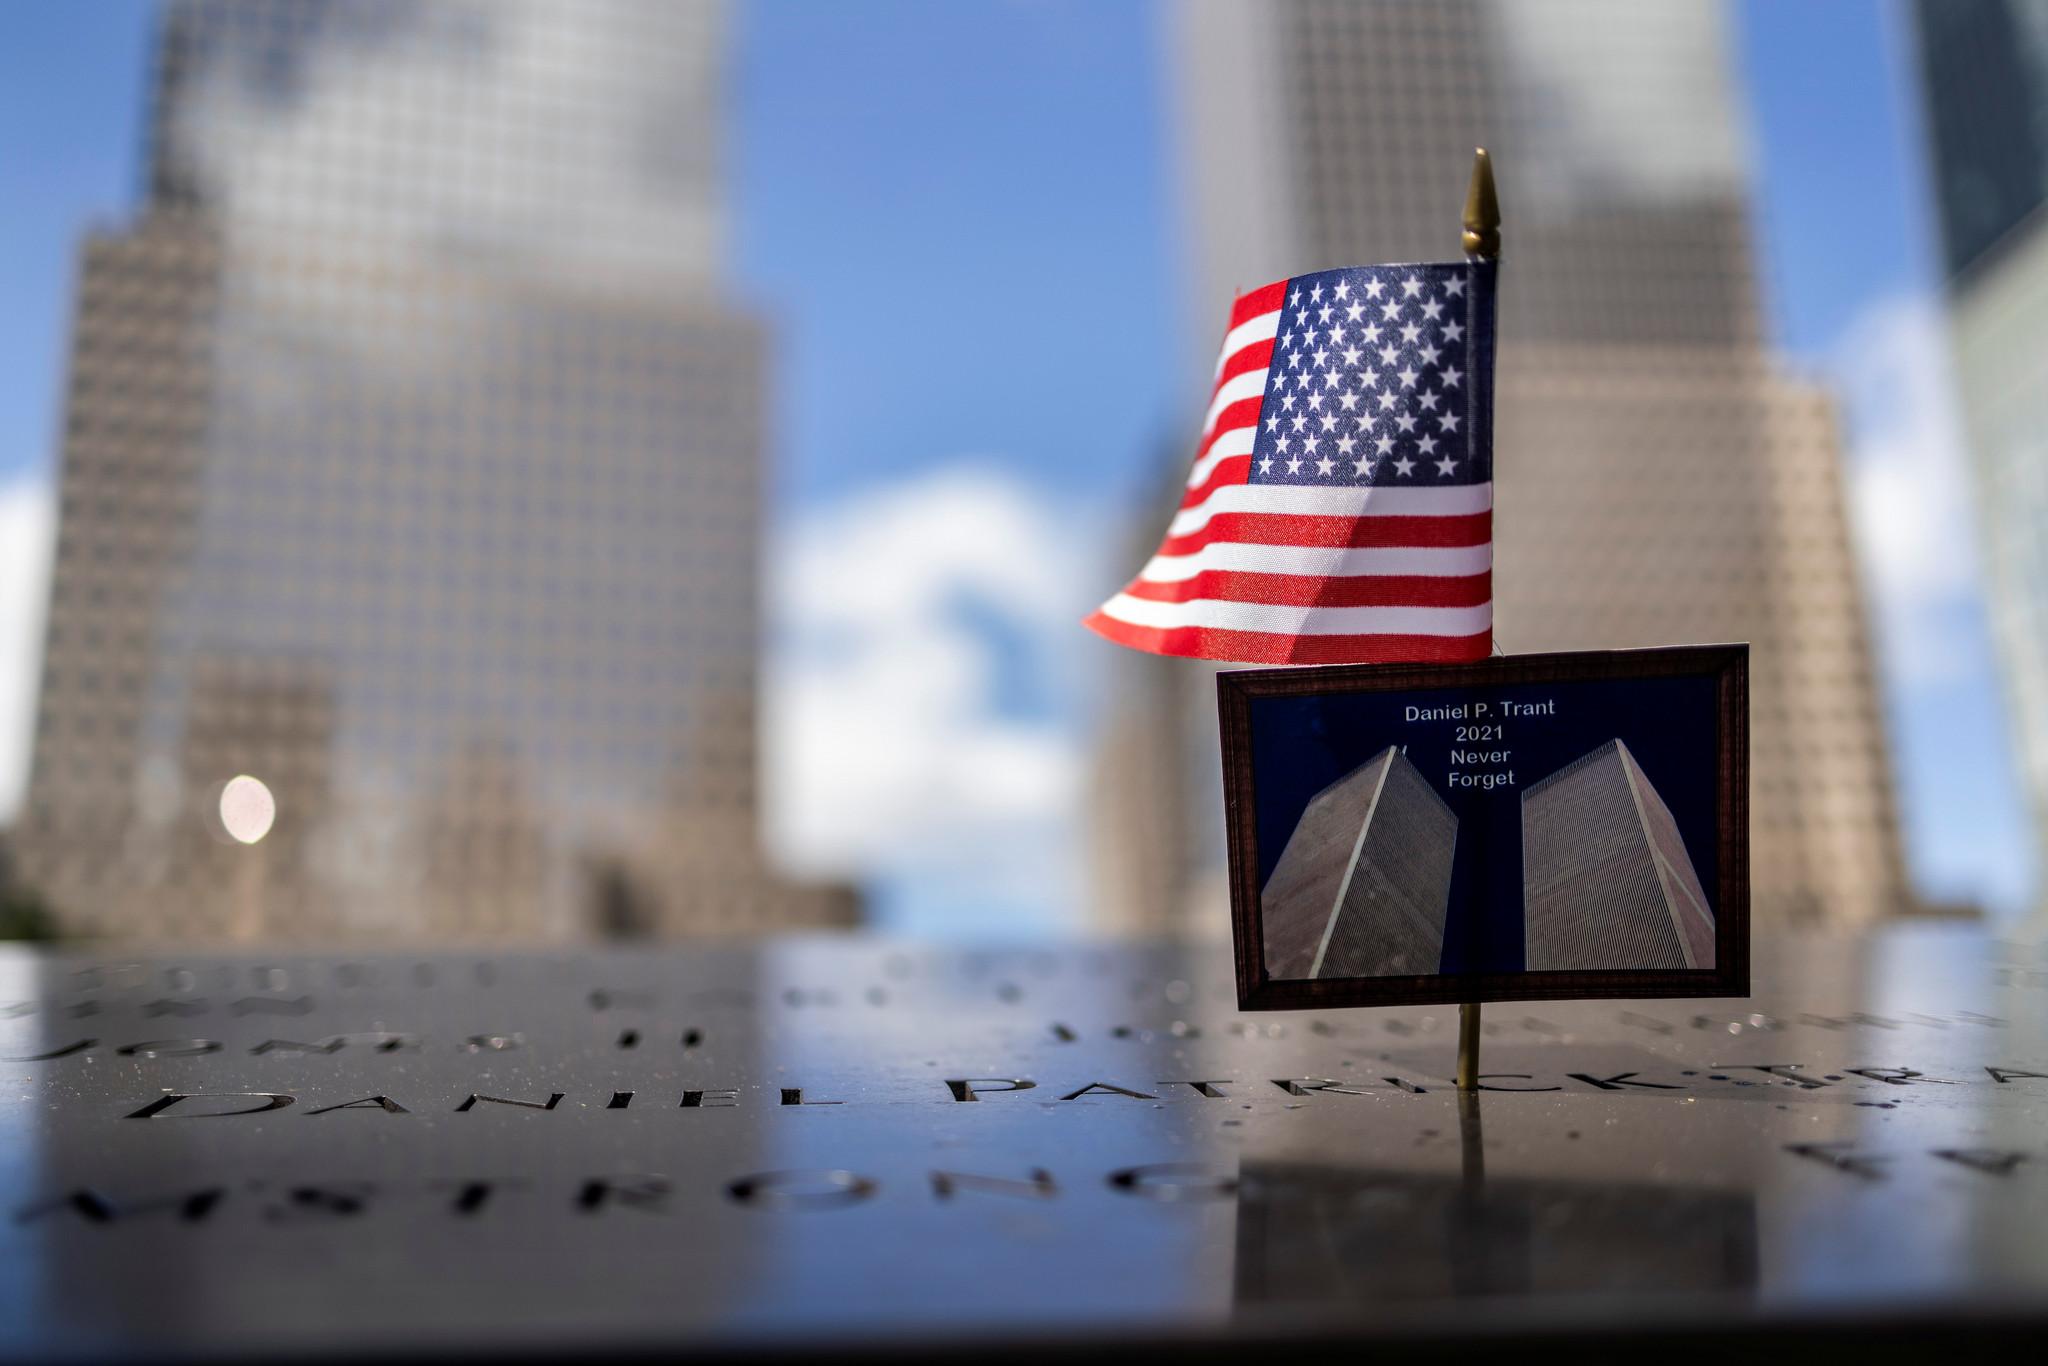 Biden visitará locais da tragédia do 11 de setembro; Nova York, Pensilvânia e Pentágono